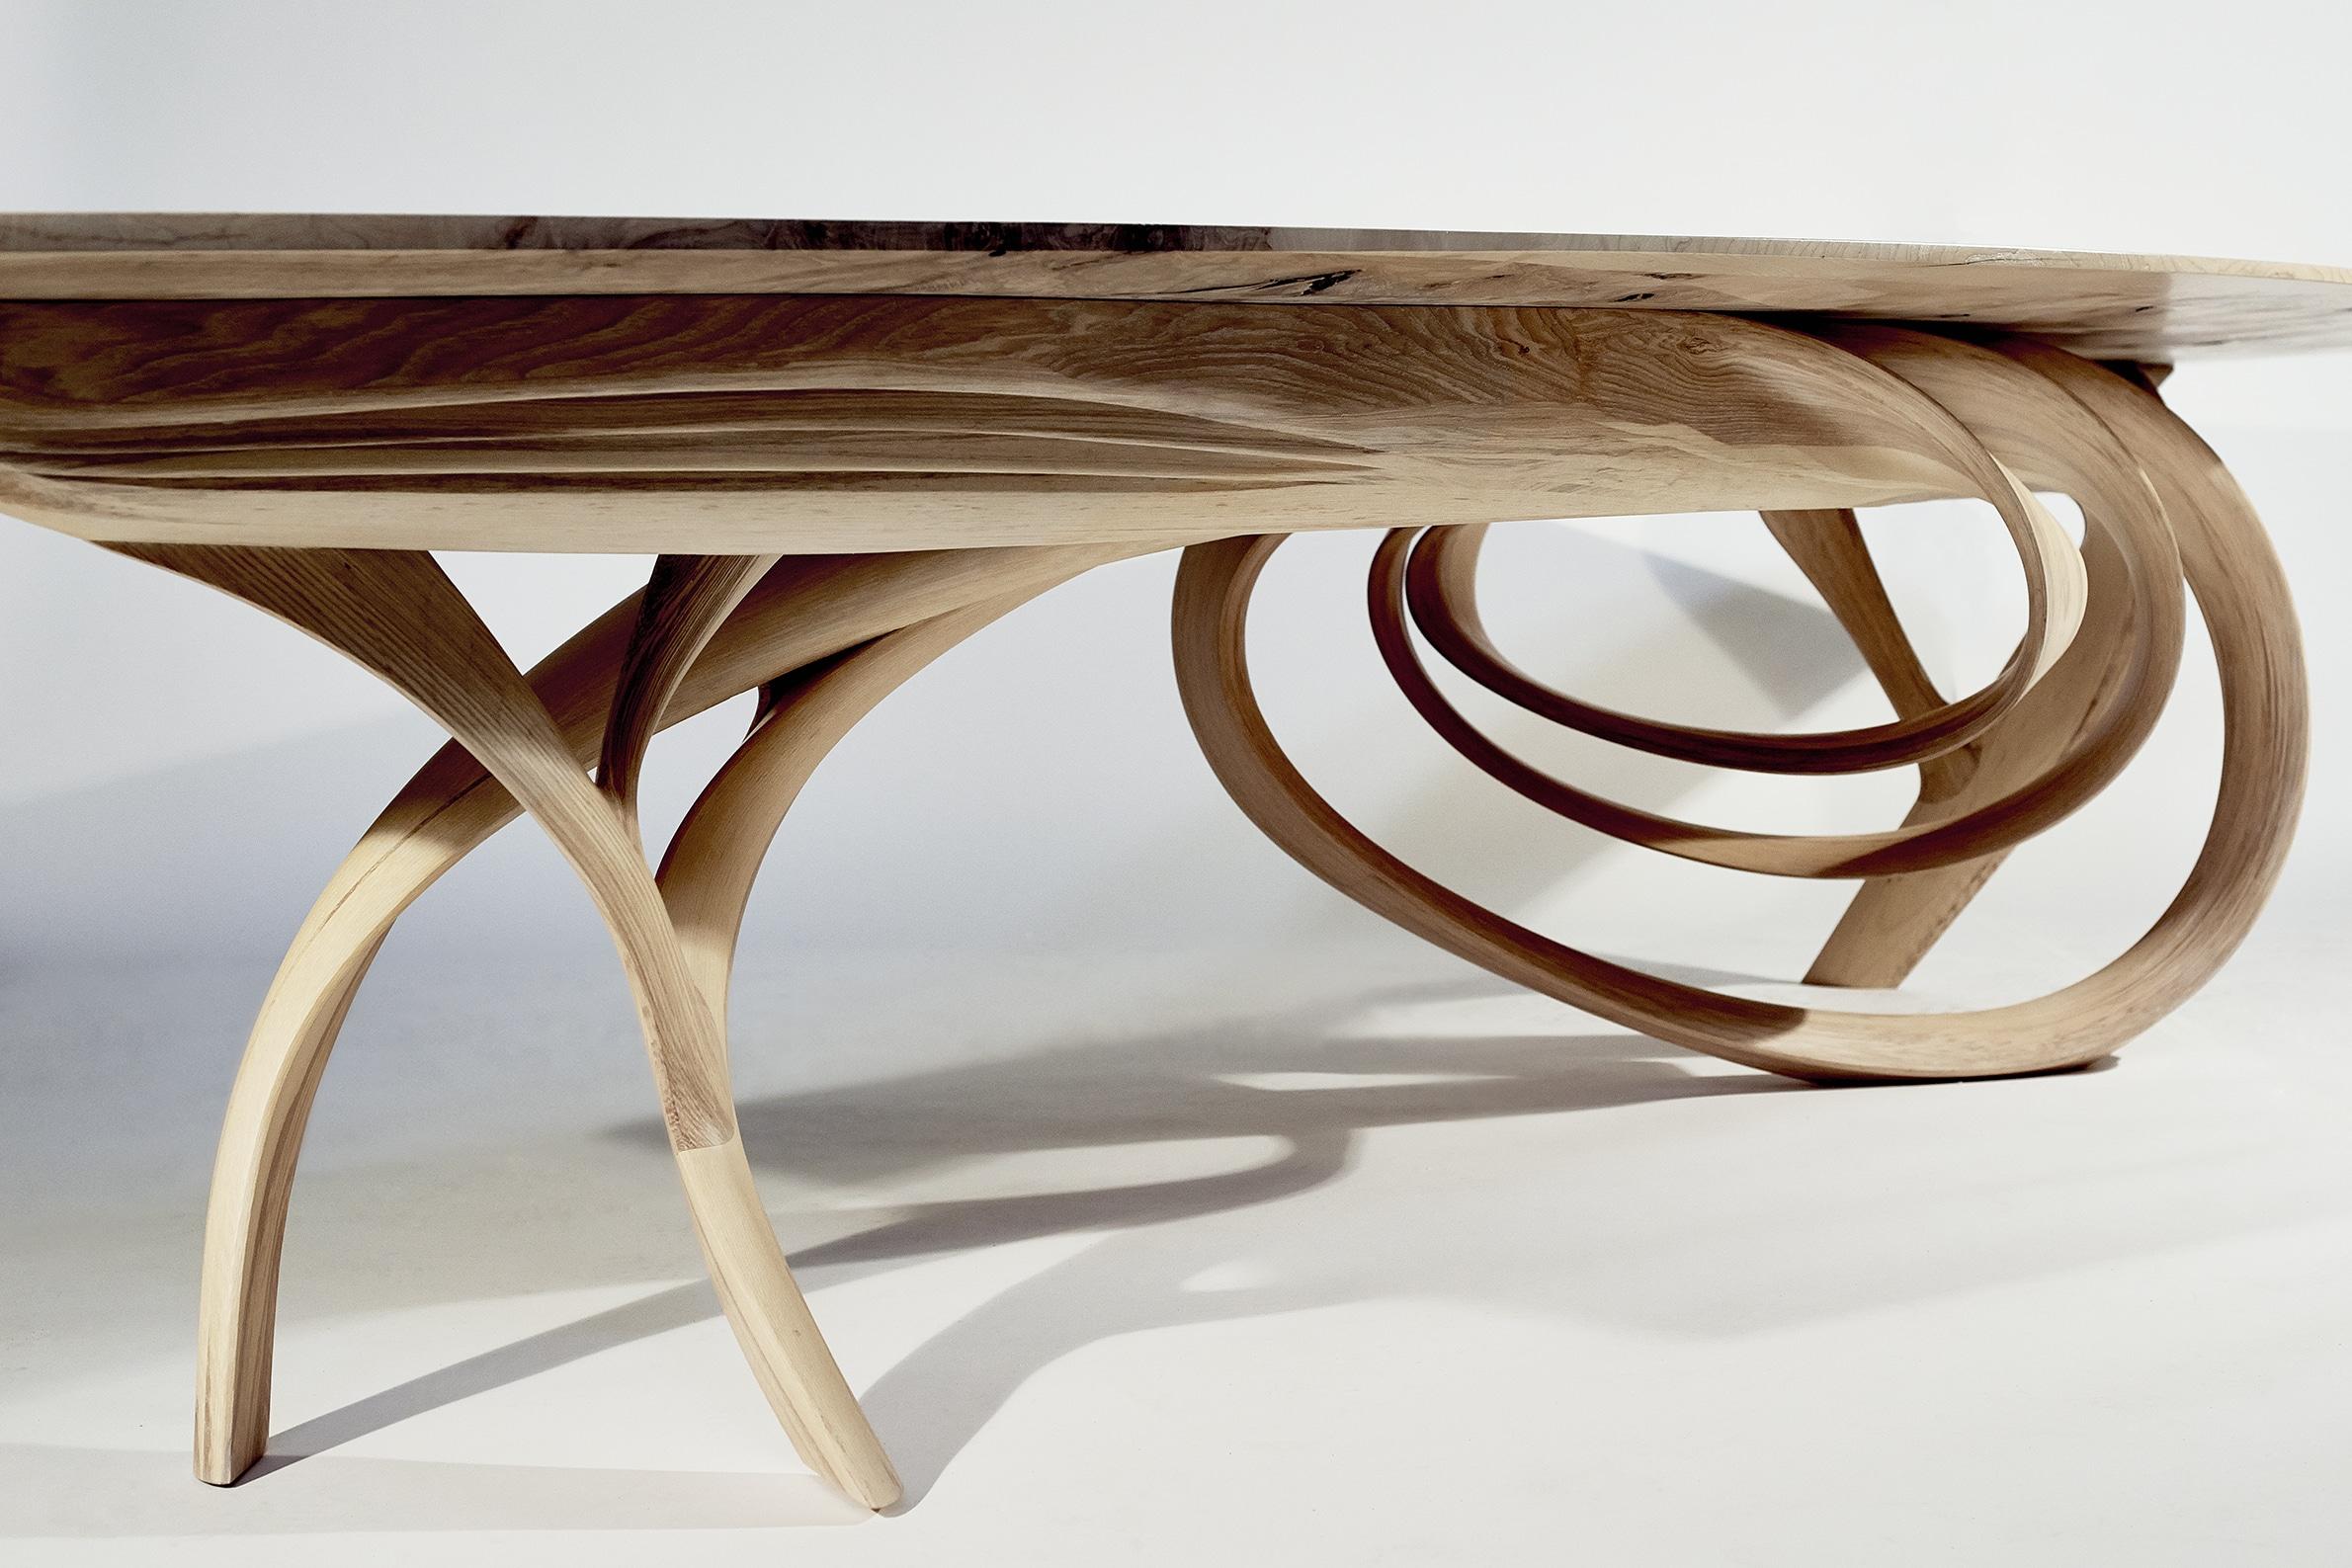 Joseph Walsh, Enignum VIII Dining Table, IRE, 2012 | Todd Merrill ...